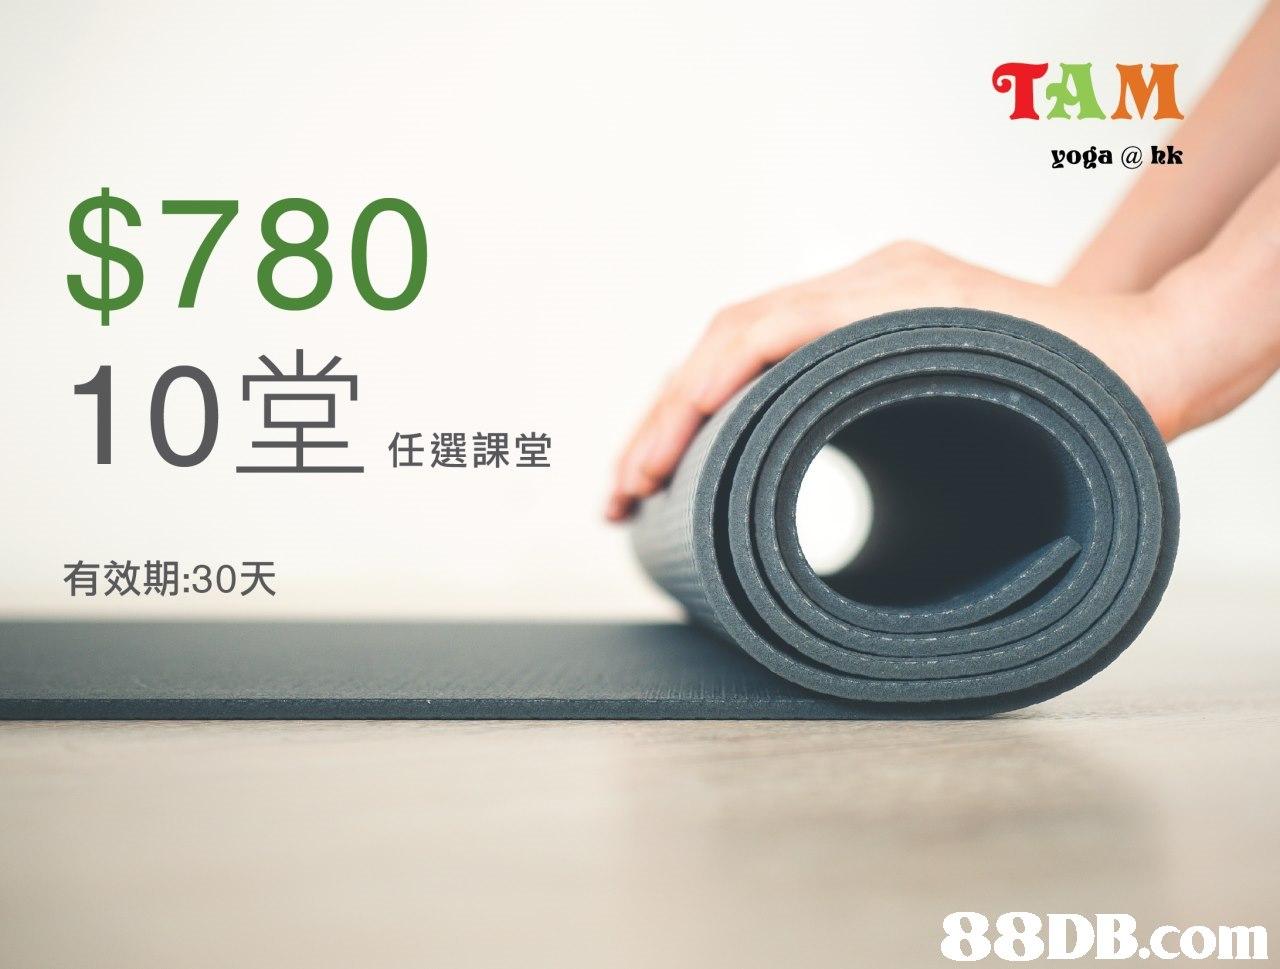 TAM yoga @ kk $780 10堂任選課堂 有效期:30天 88DB.com,product